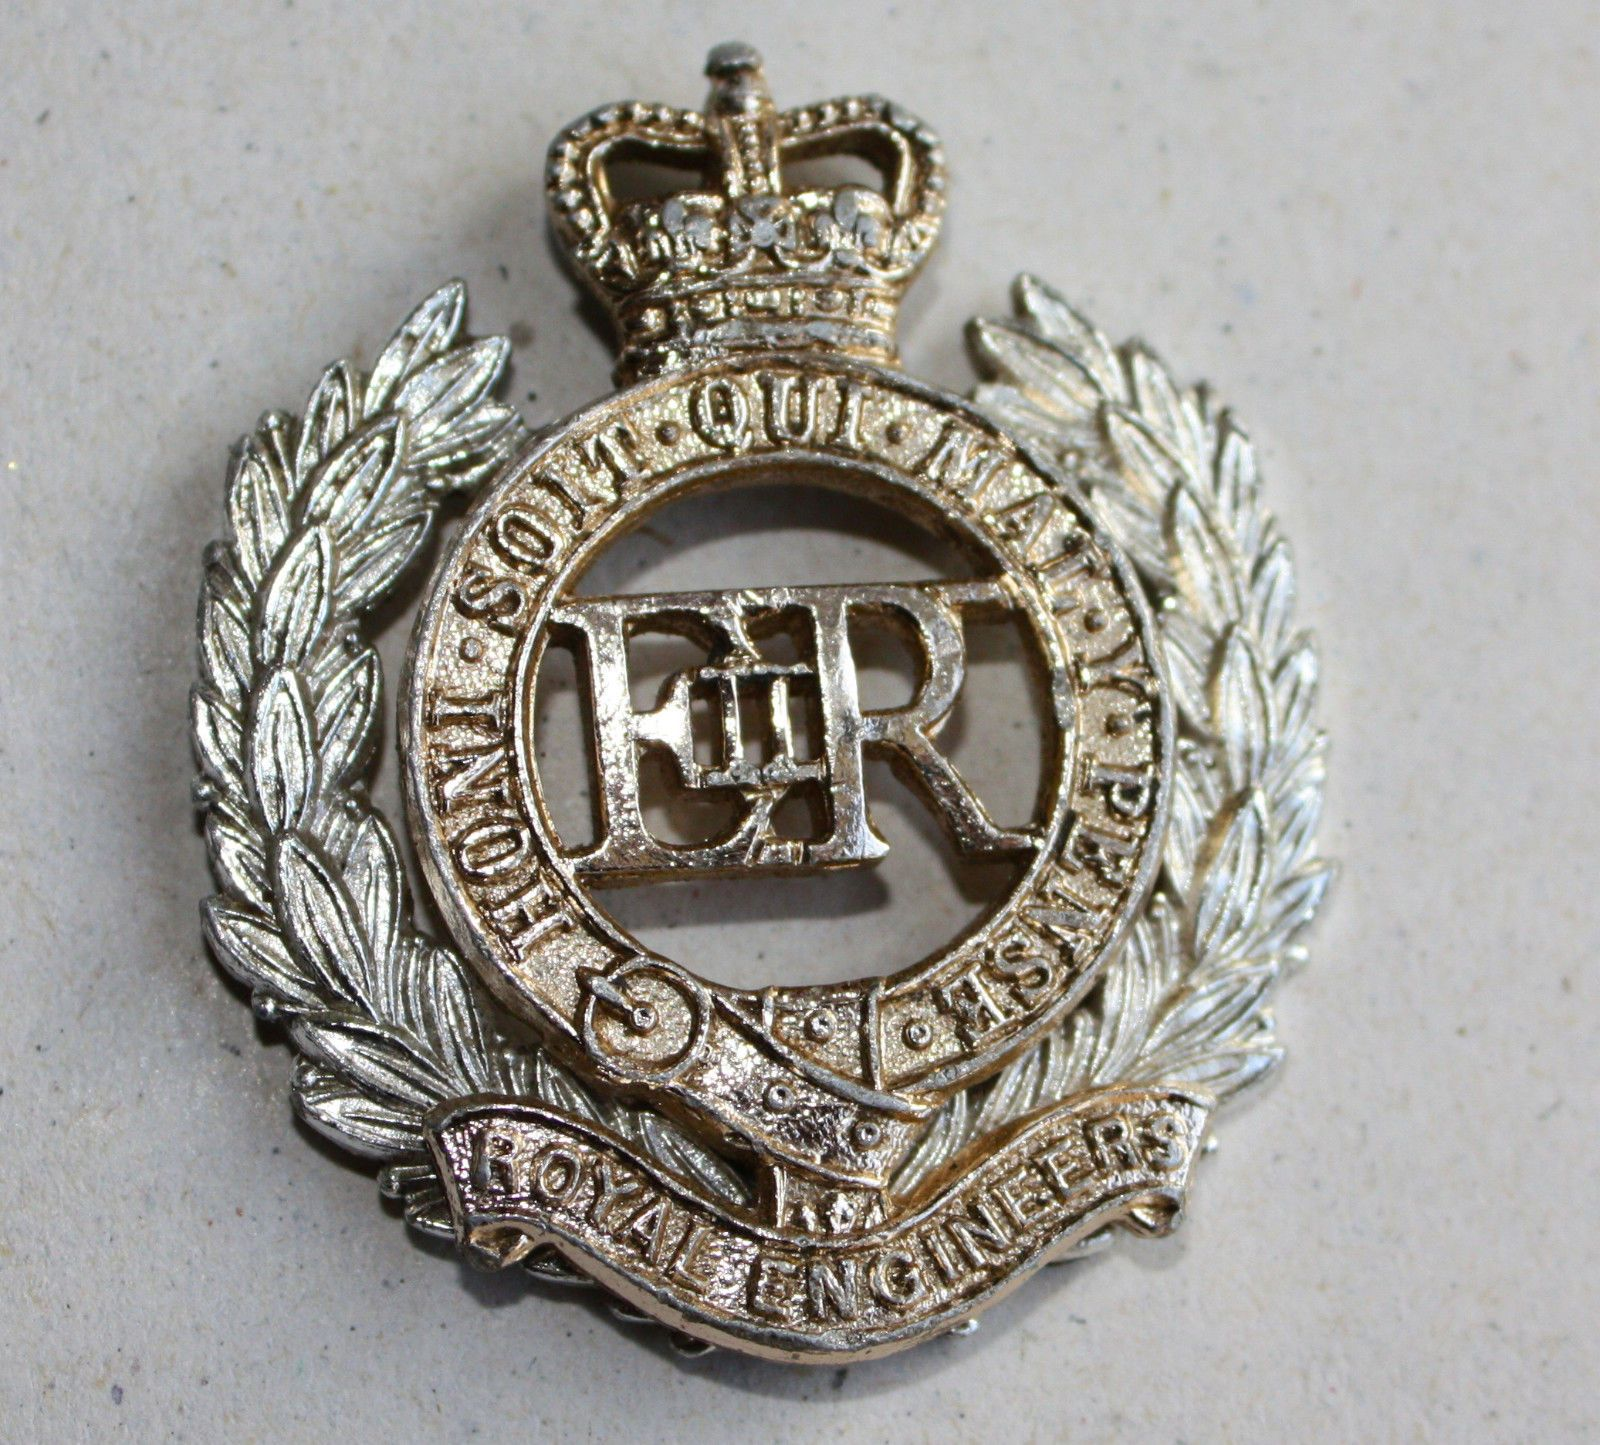 Royal engineers british army #military anodised cap #badge